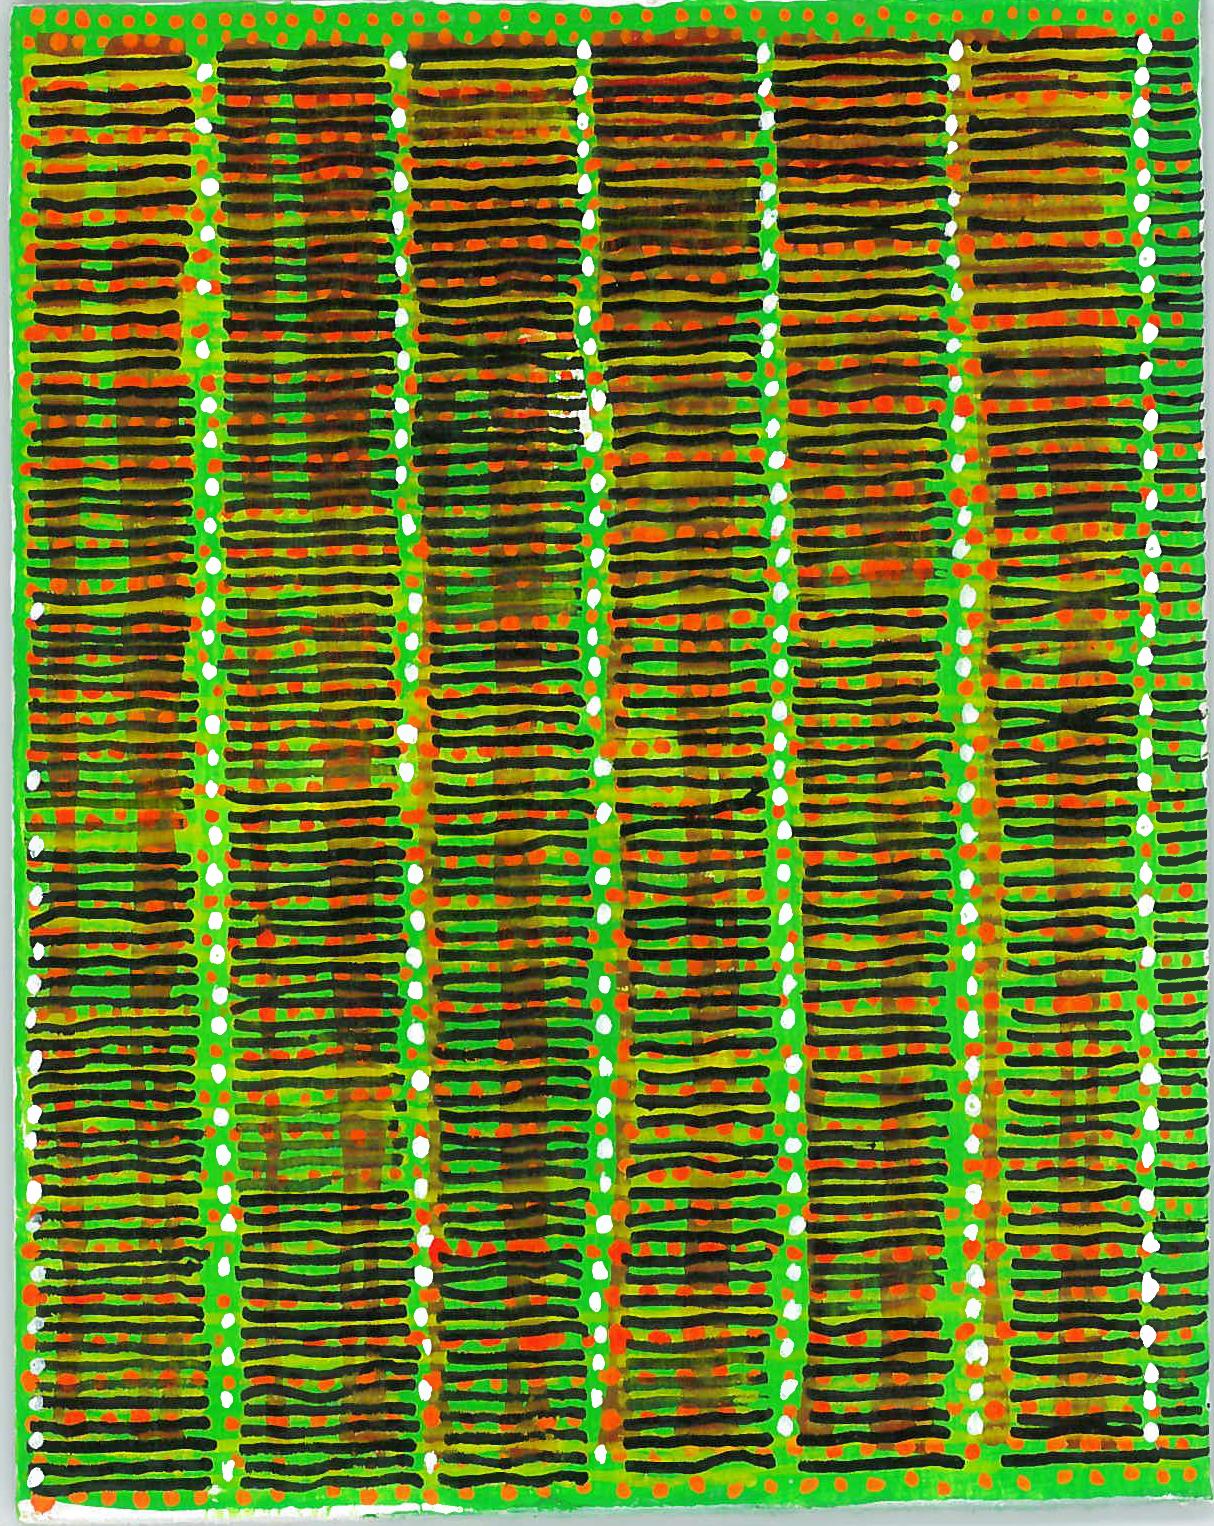 radical warp 14 green drawing by stella untalan